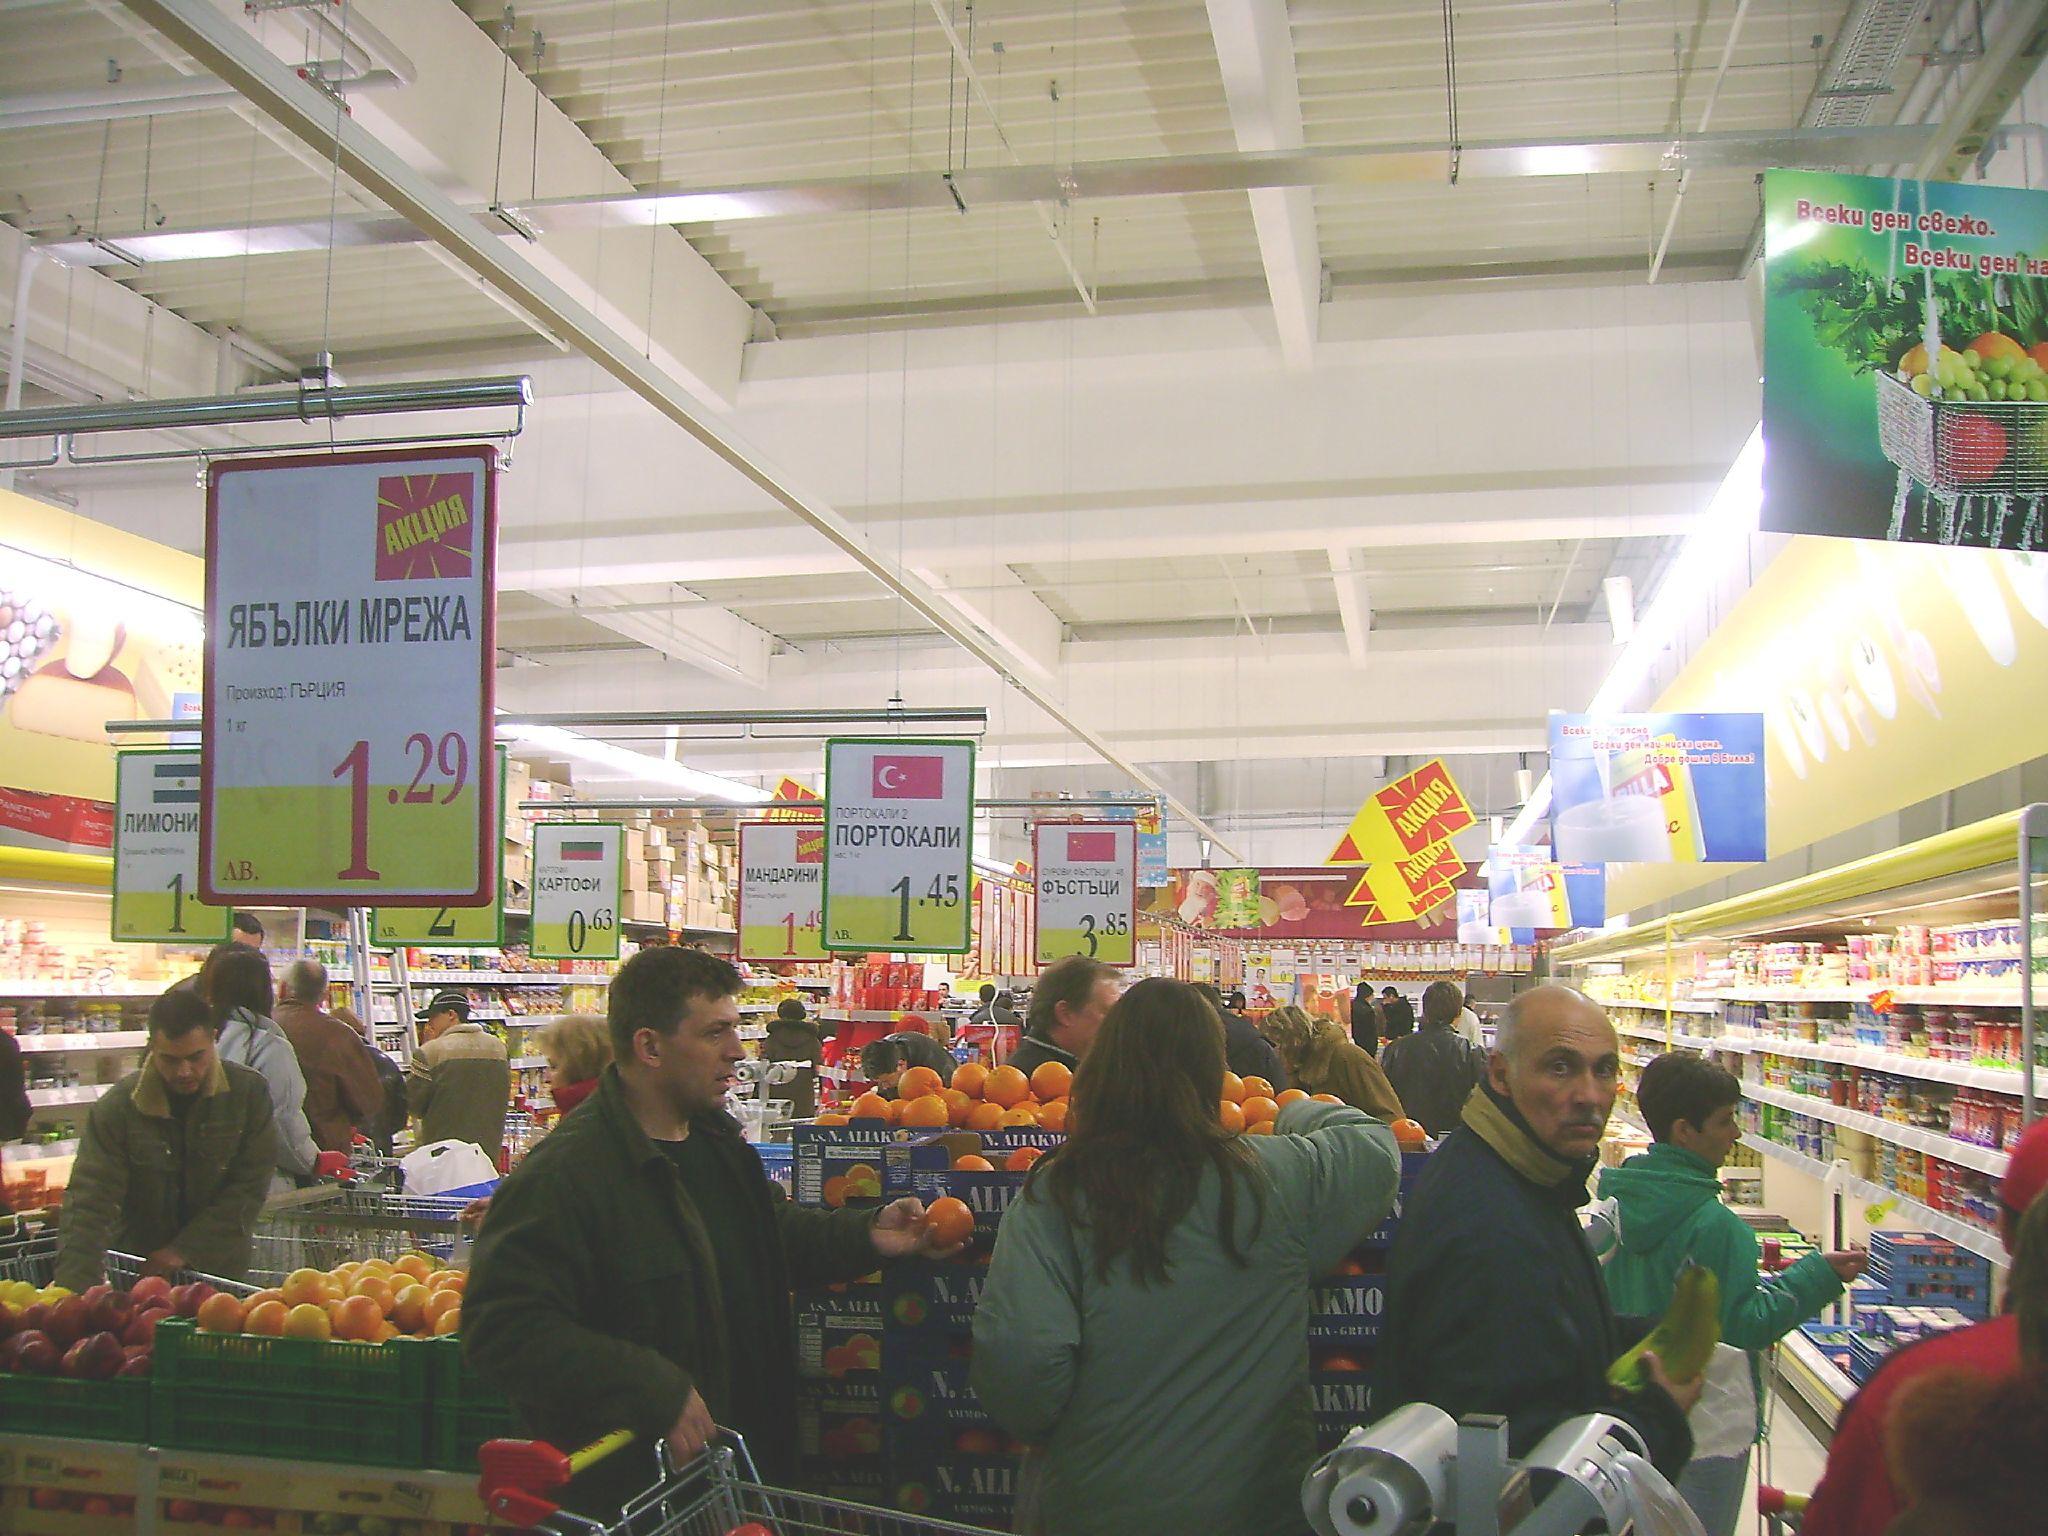 Croatia's anti-trust regulator approves Spar's acquisition of Billa